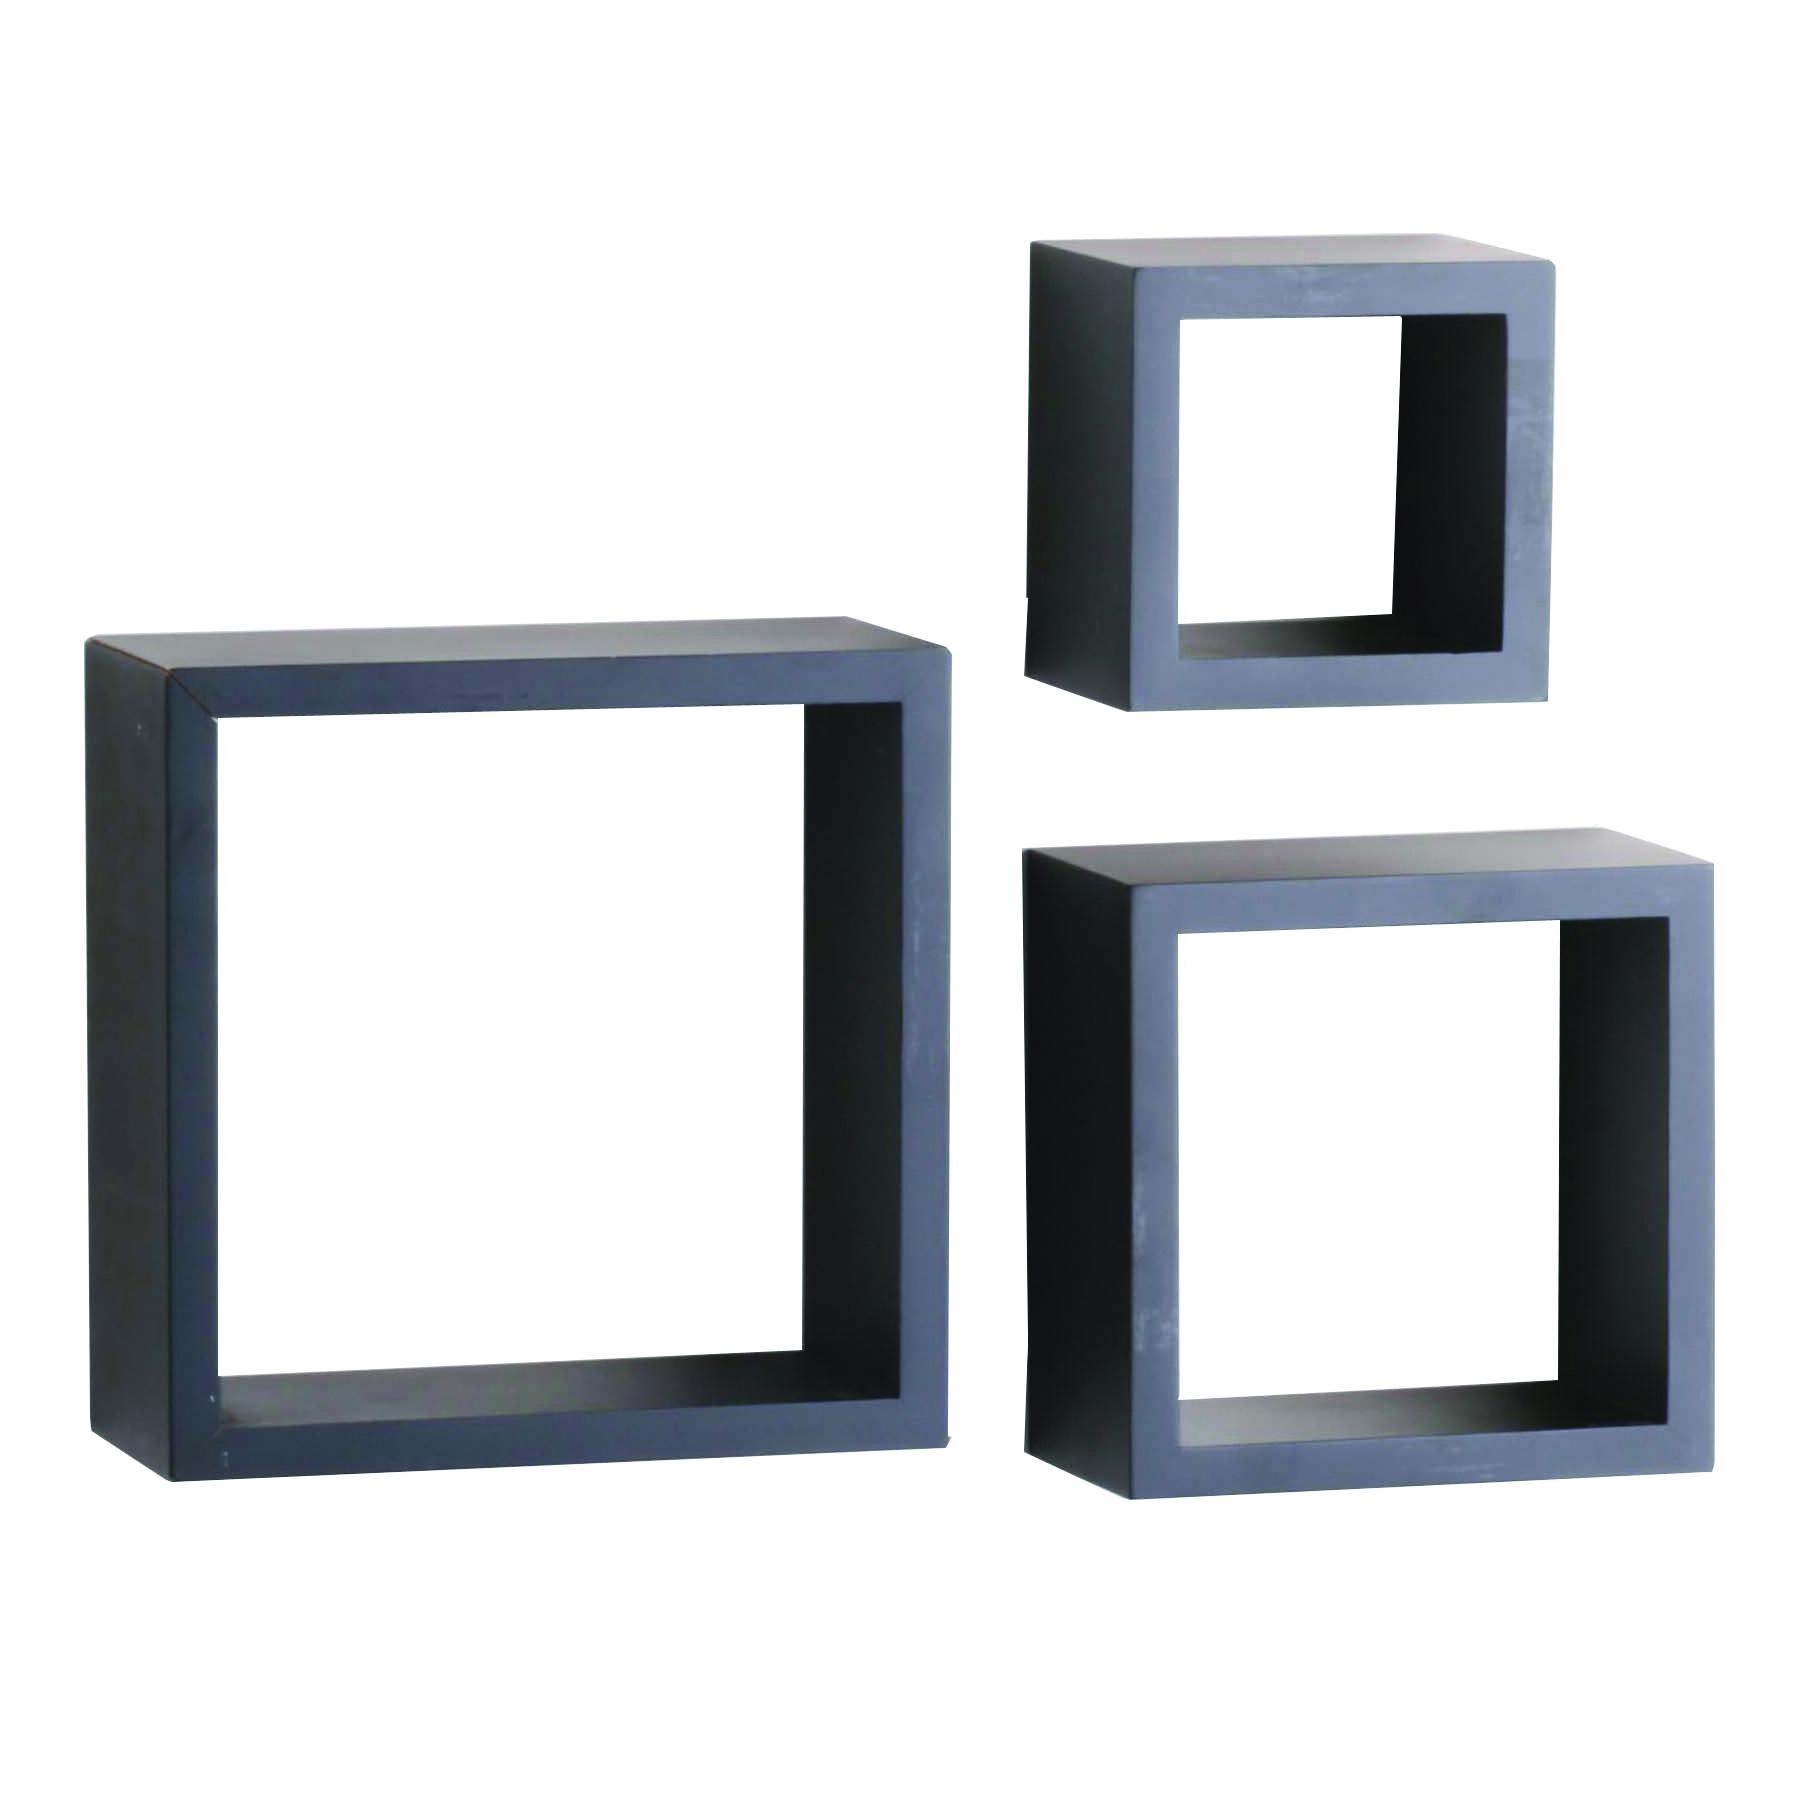 Picture of Knape & Vogt Shelf-Made 240-BK Shadow Box Kit, 50 lb, 3-Shelf, 4 in L, Wood